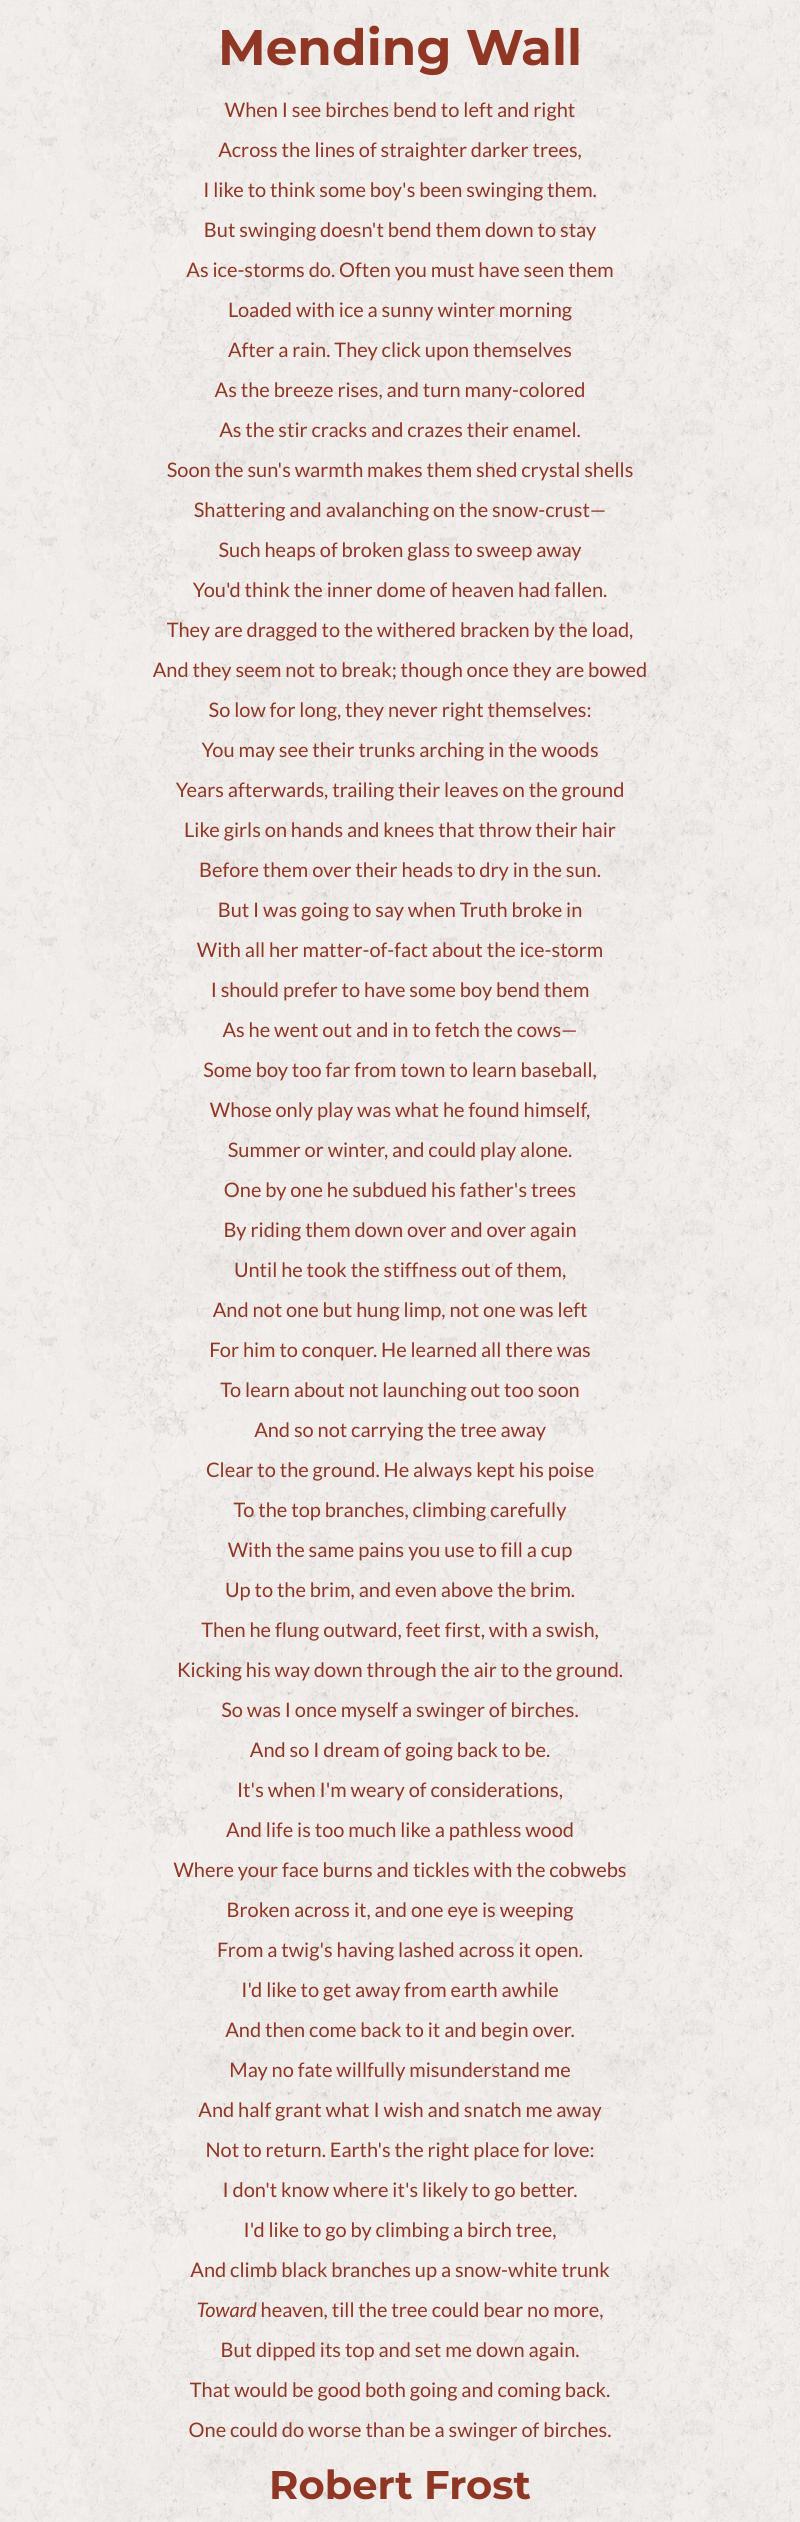 Mending Wall Poem Summary William Blake Of The Ozymandia By Shelley